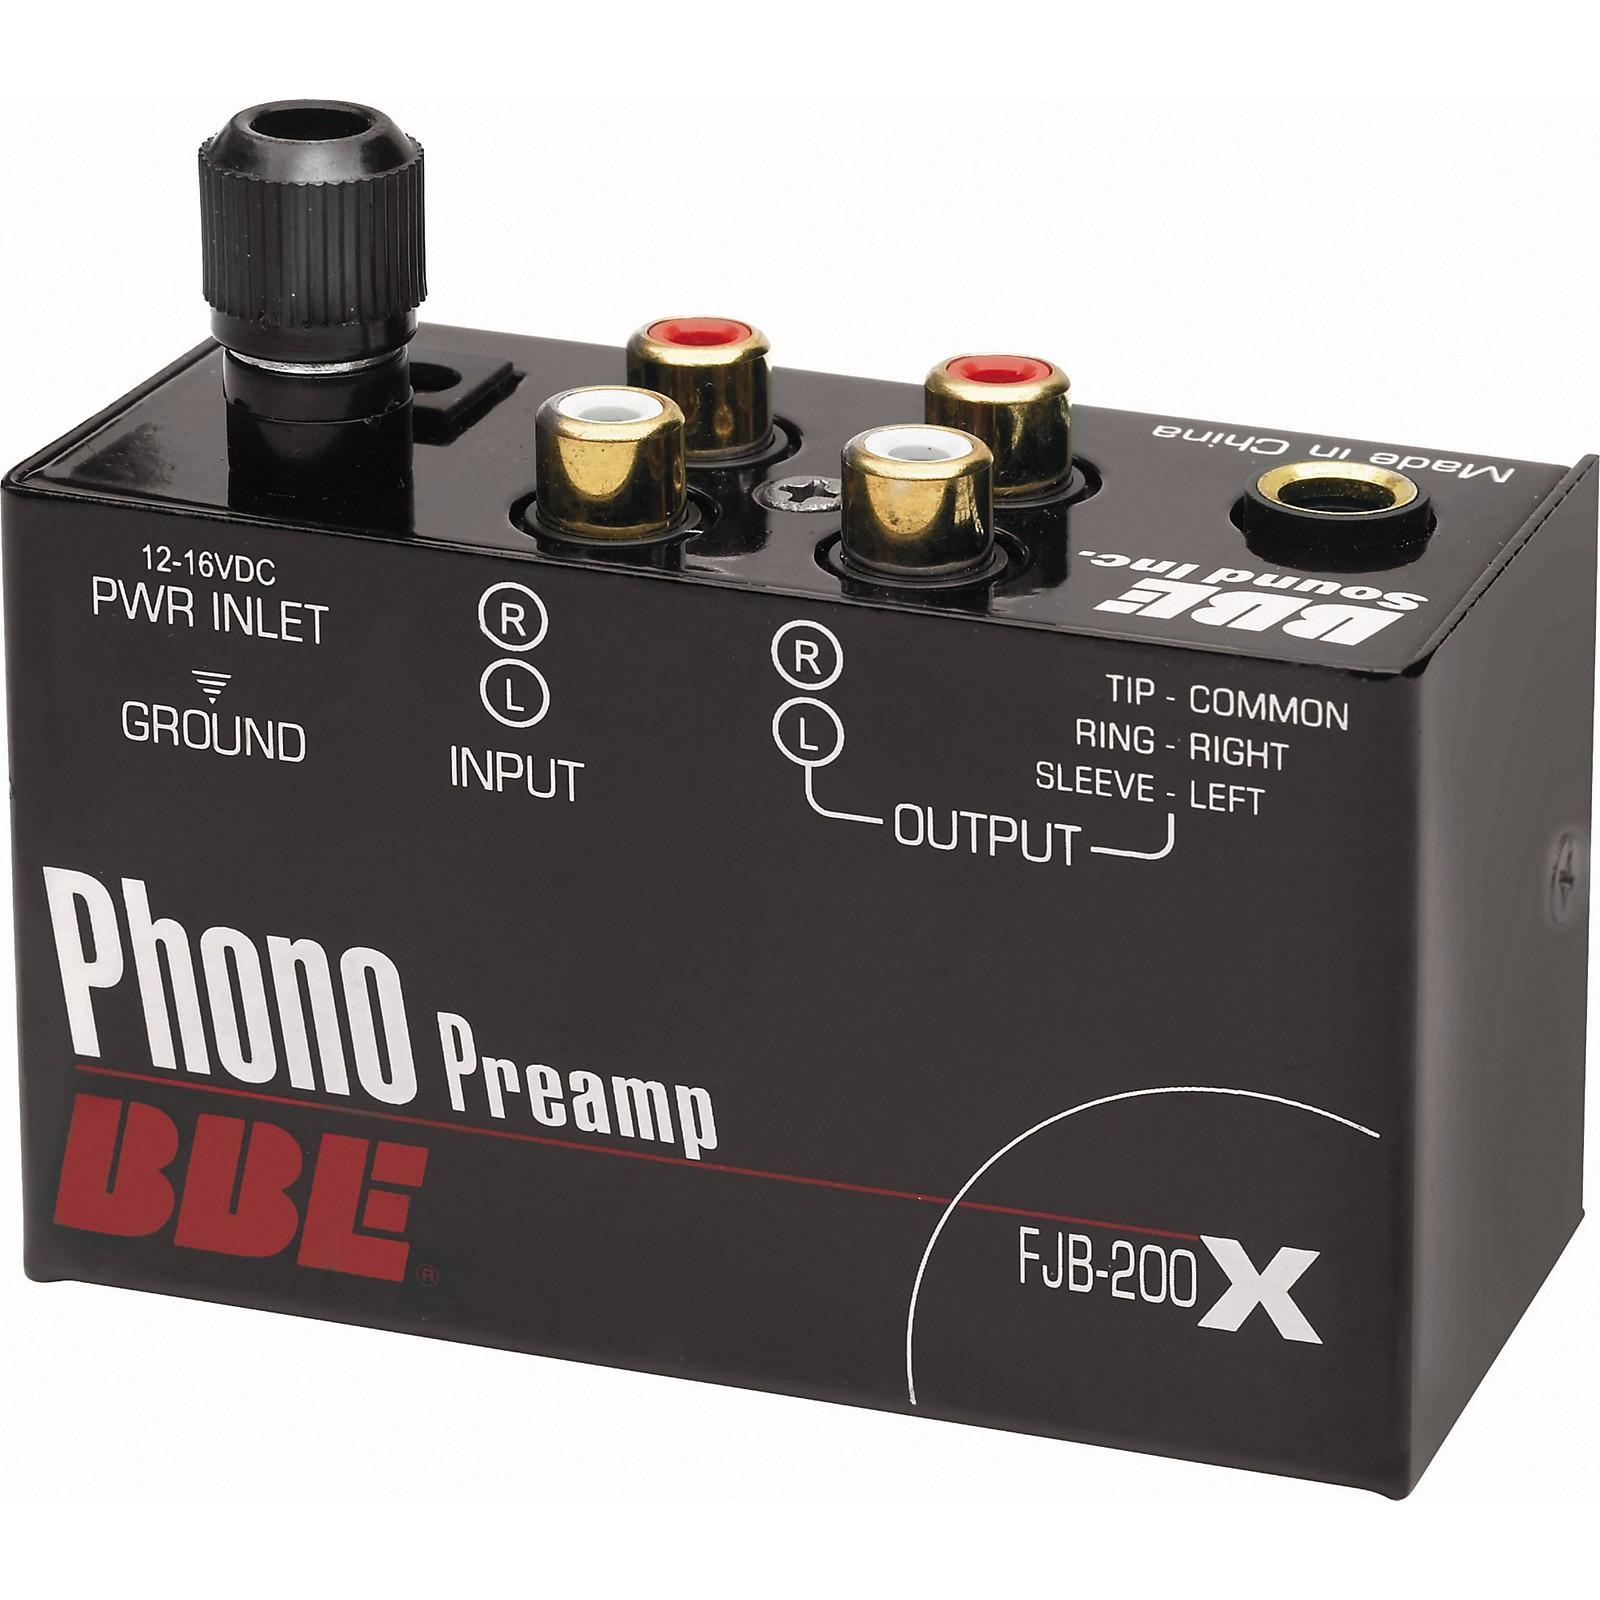 Open Box BBE FJB-200X Phono Preamp